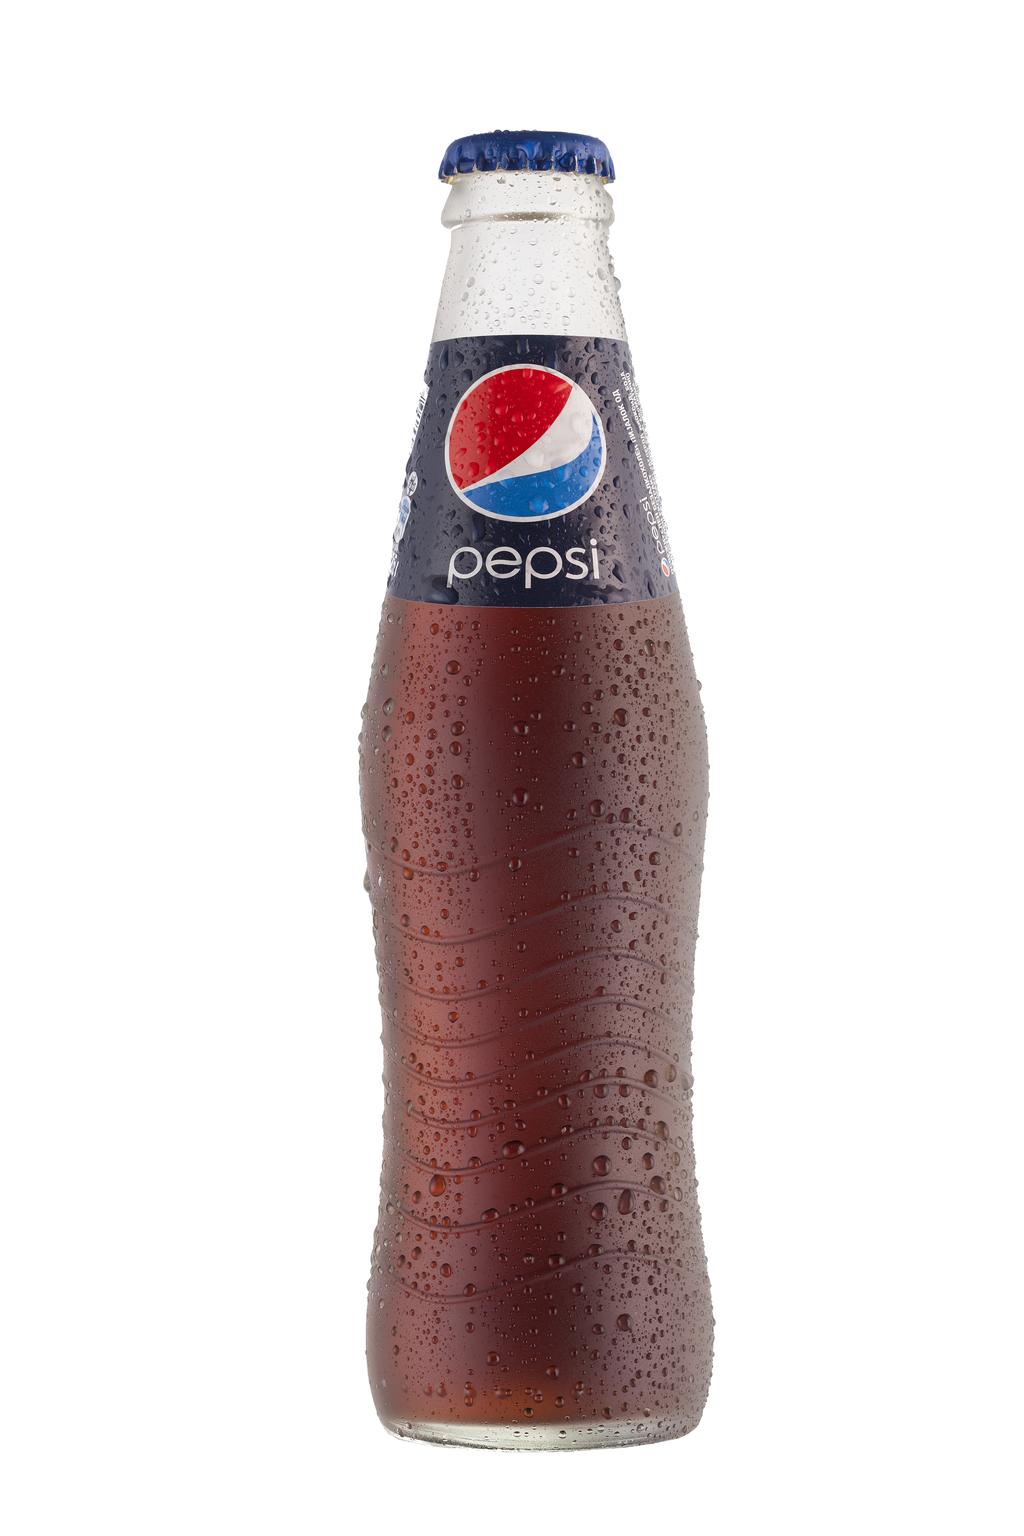 Pepsi png image purepng. Drinks clipart cold drink bottle